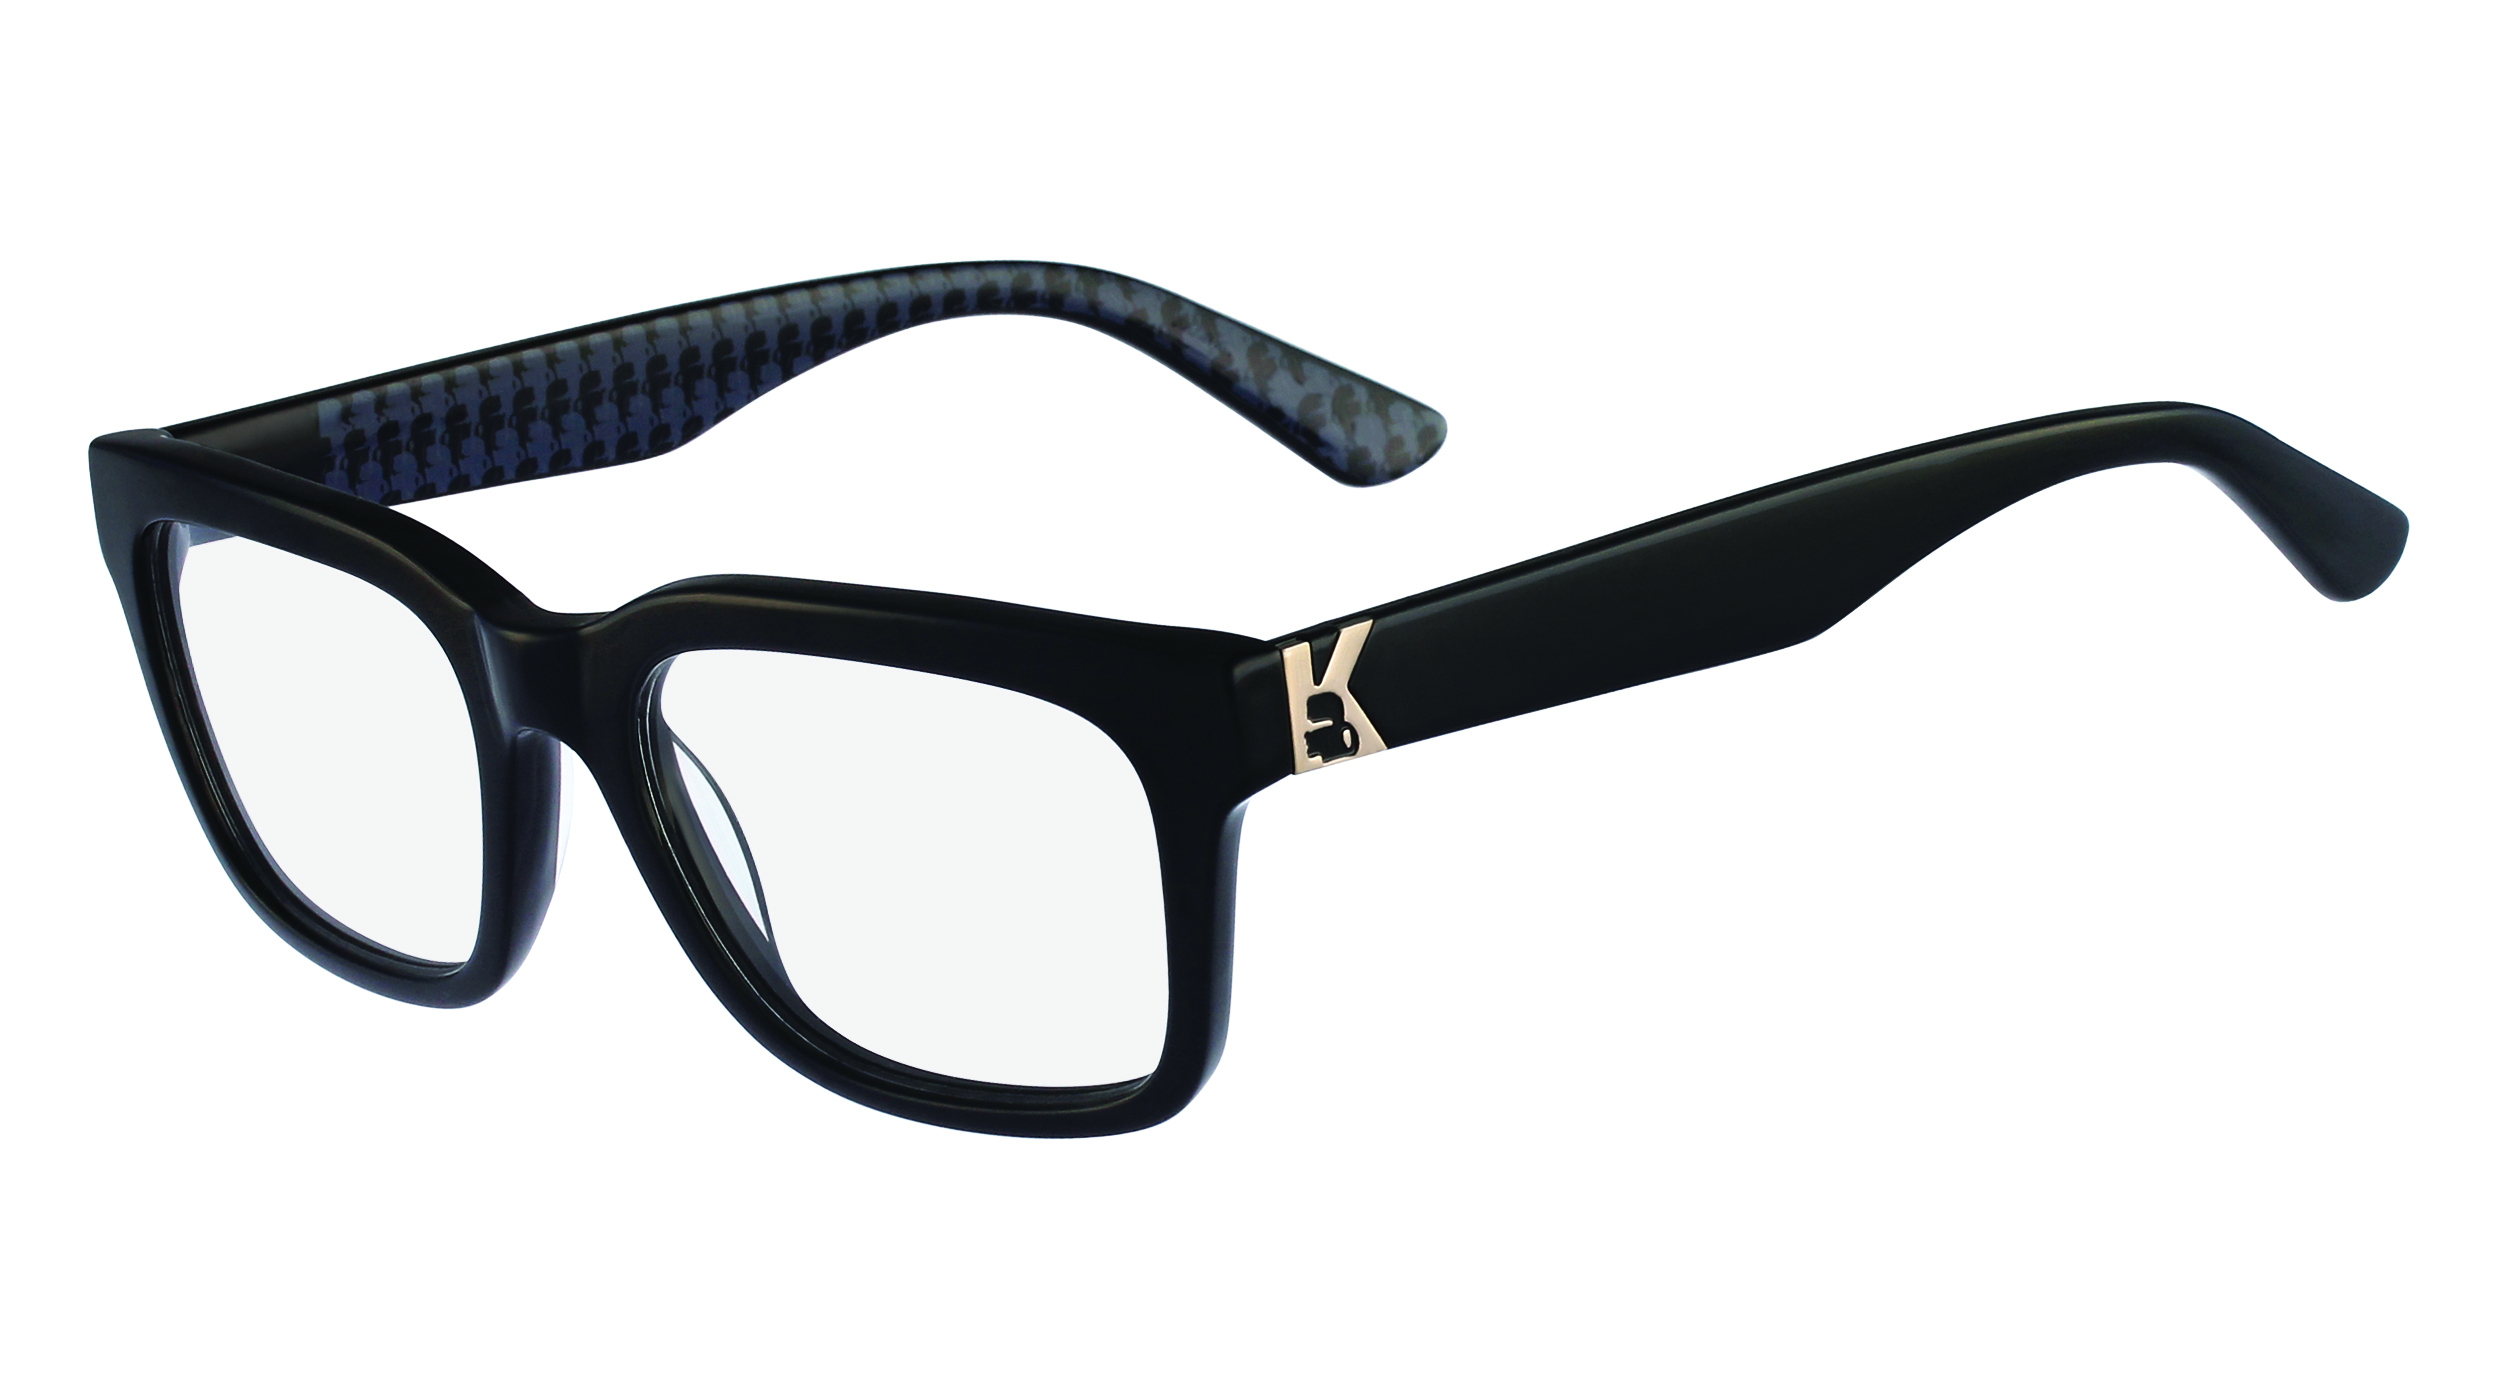 ecbf0d135629af Karl Lagerfeld pour Optic 2000 - Luxsure